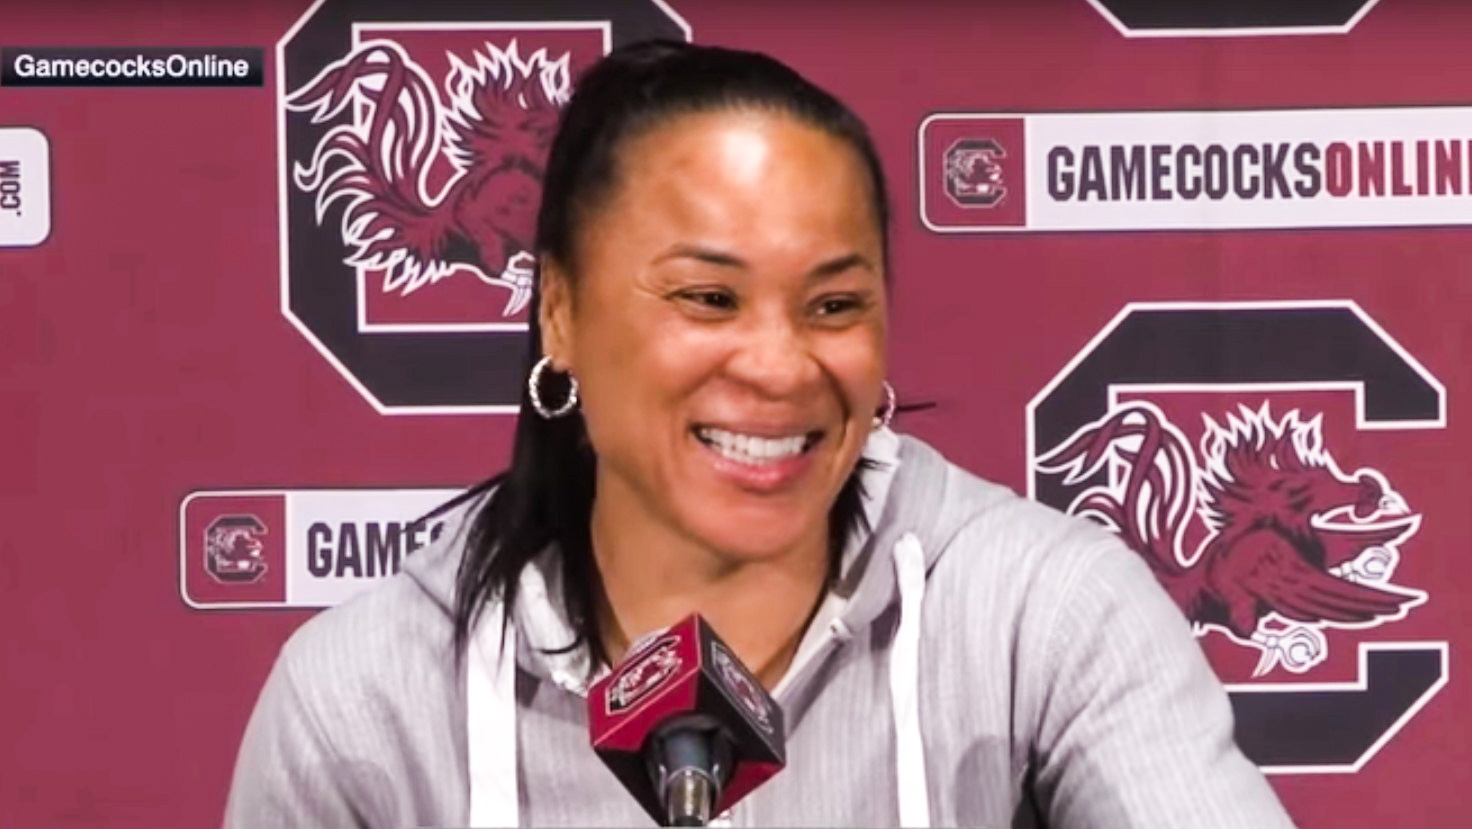 Dishin & Swishin 10/29/15 Podcast: Dawn Staley readies South Carolina for a championship run